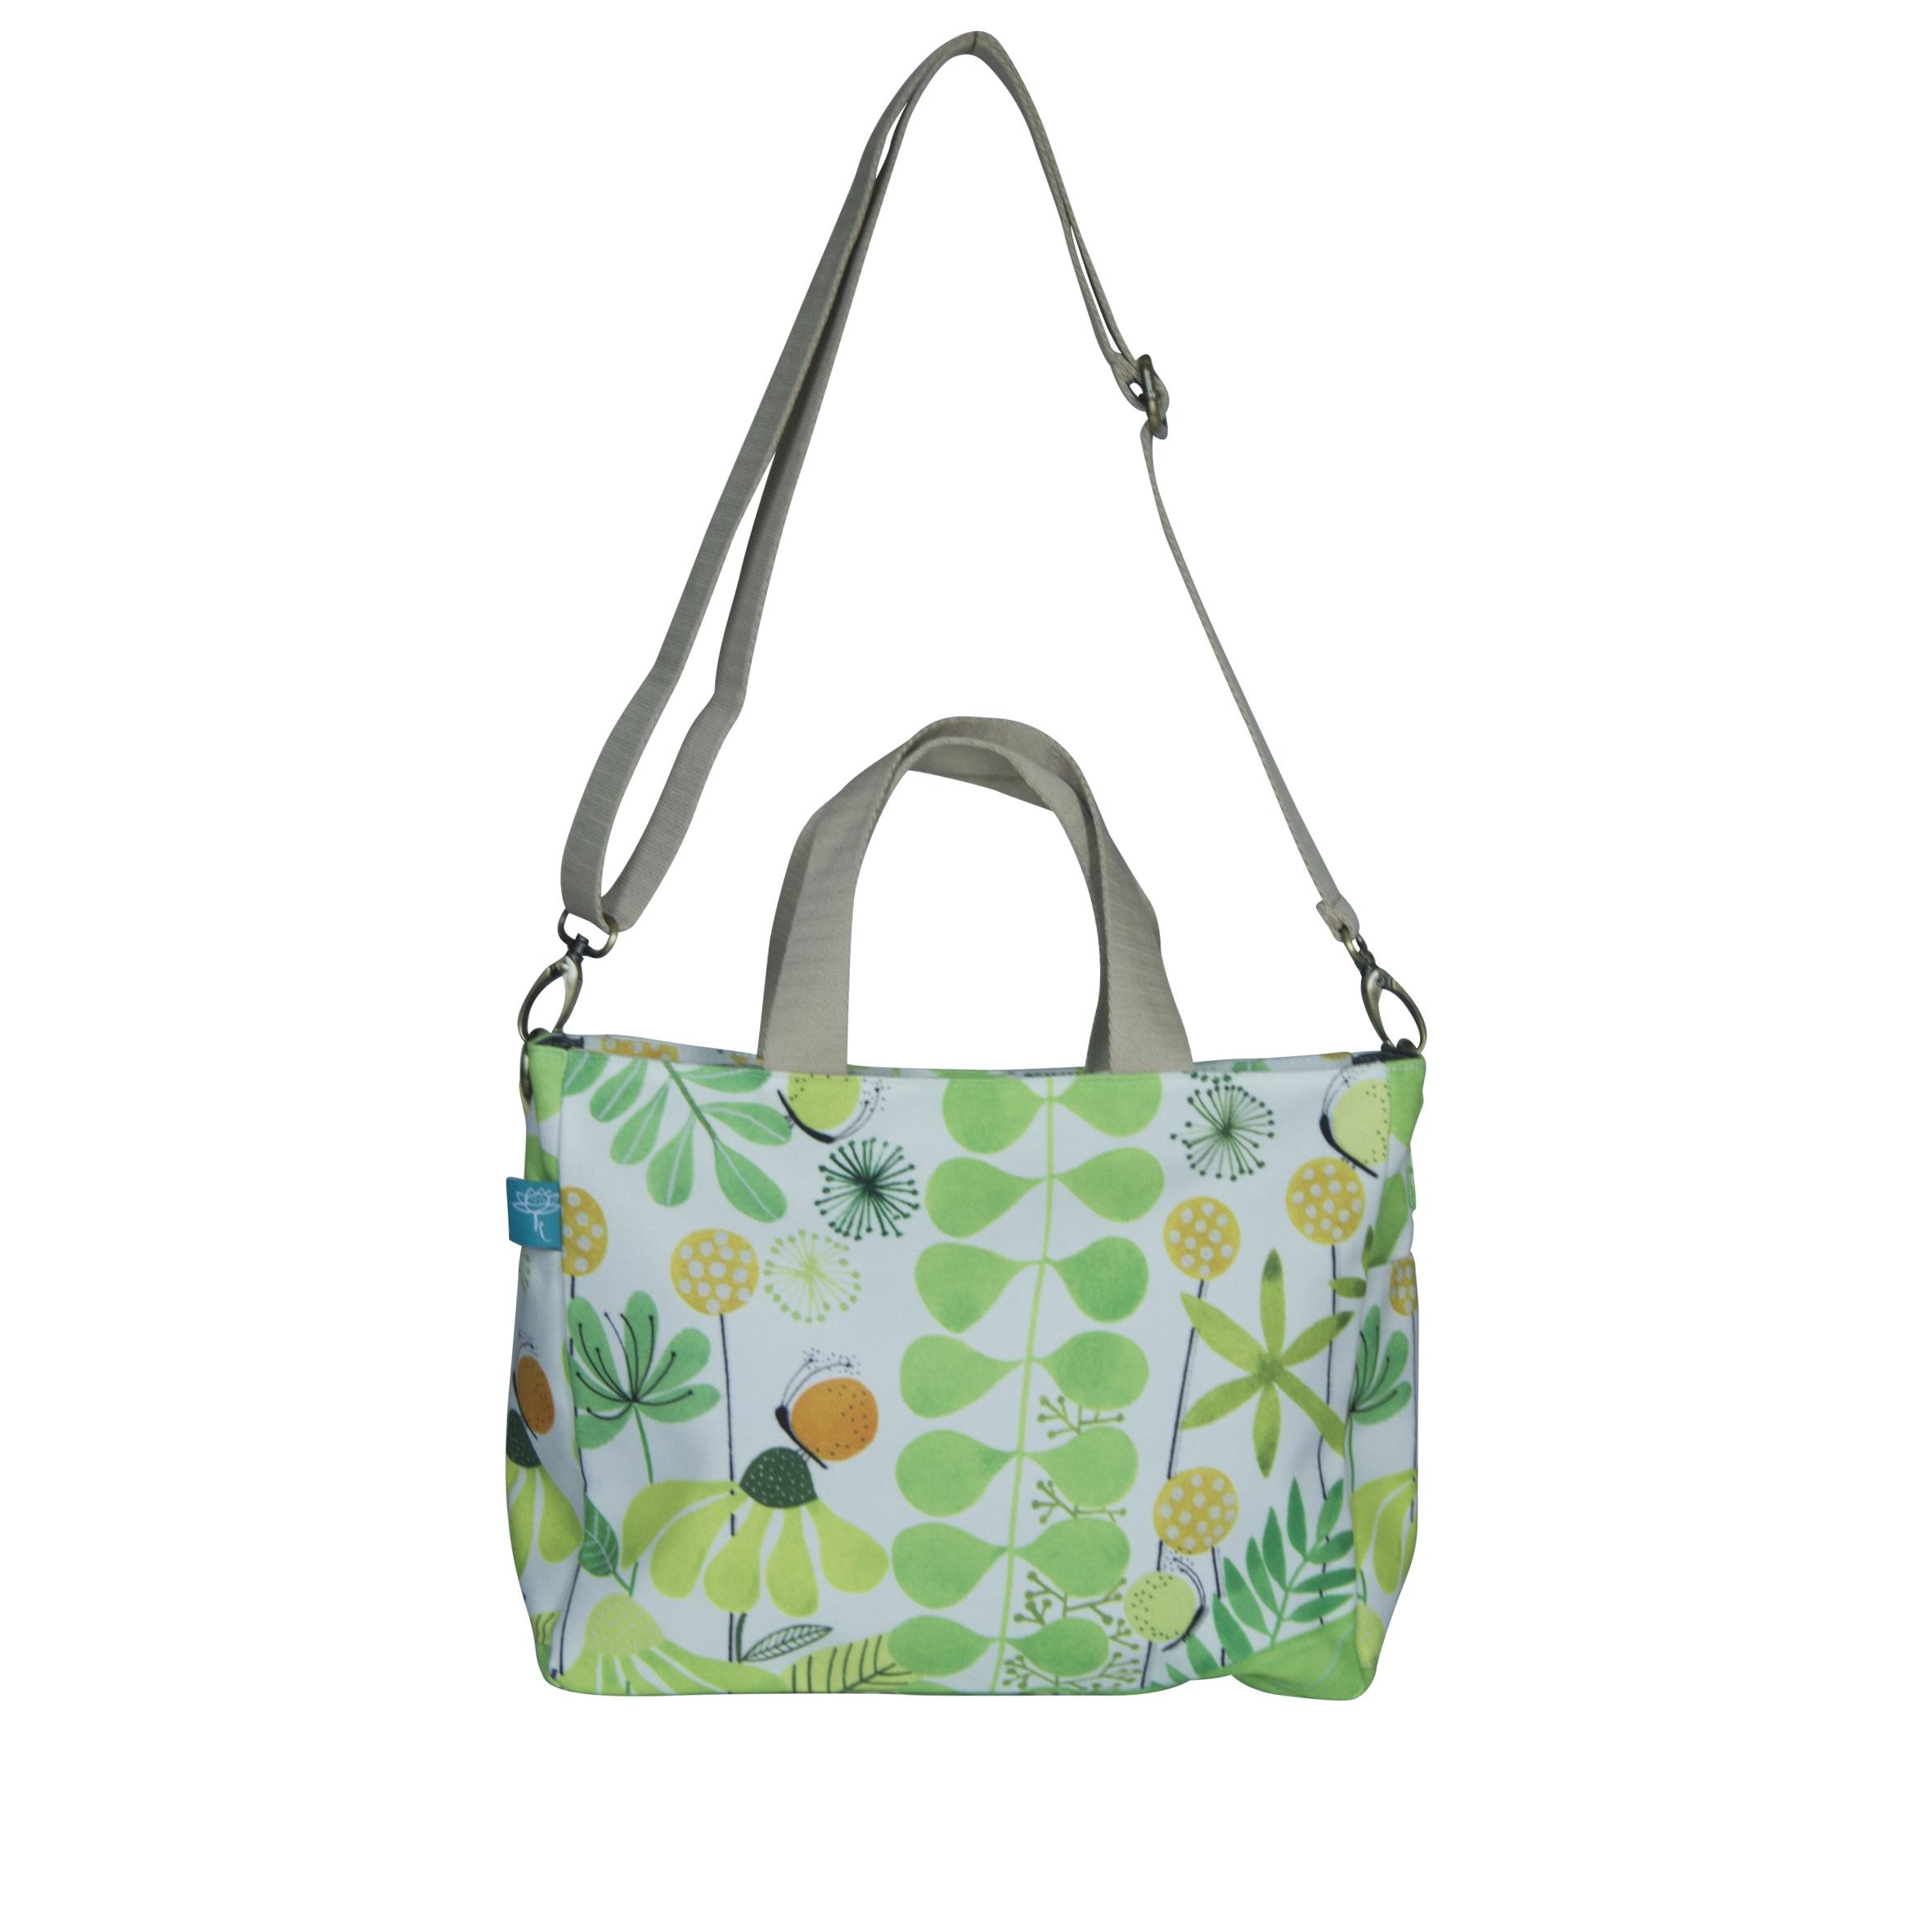 Flower Green Jhonny Bag Sling